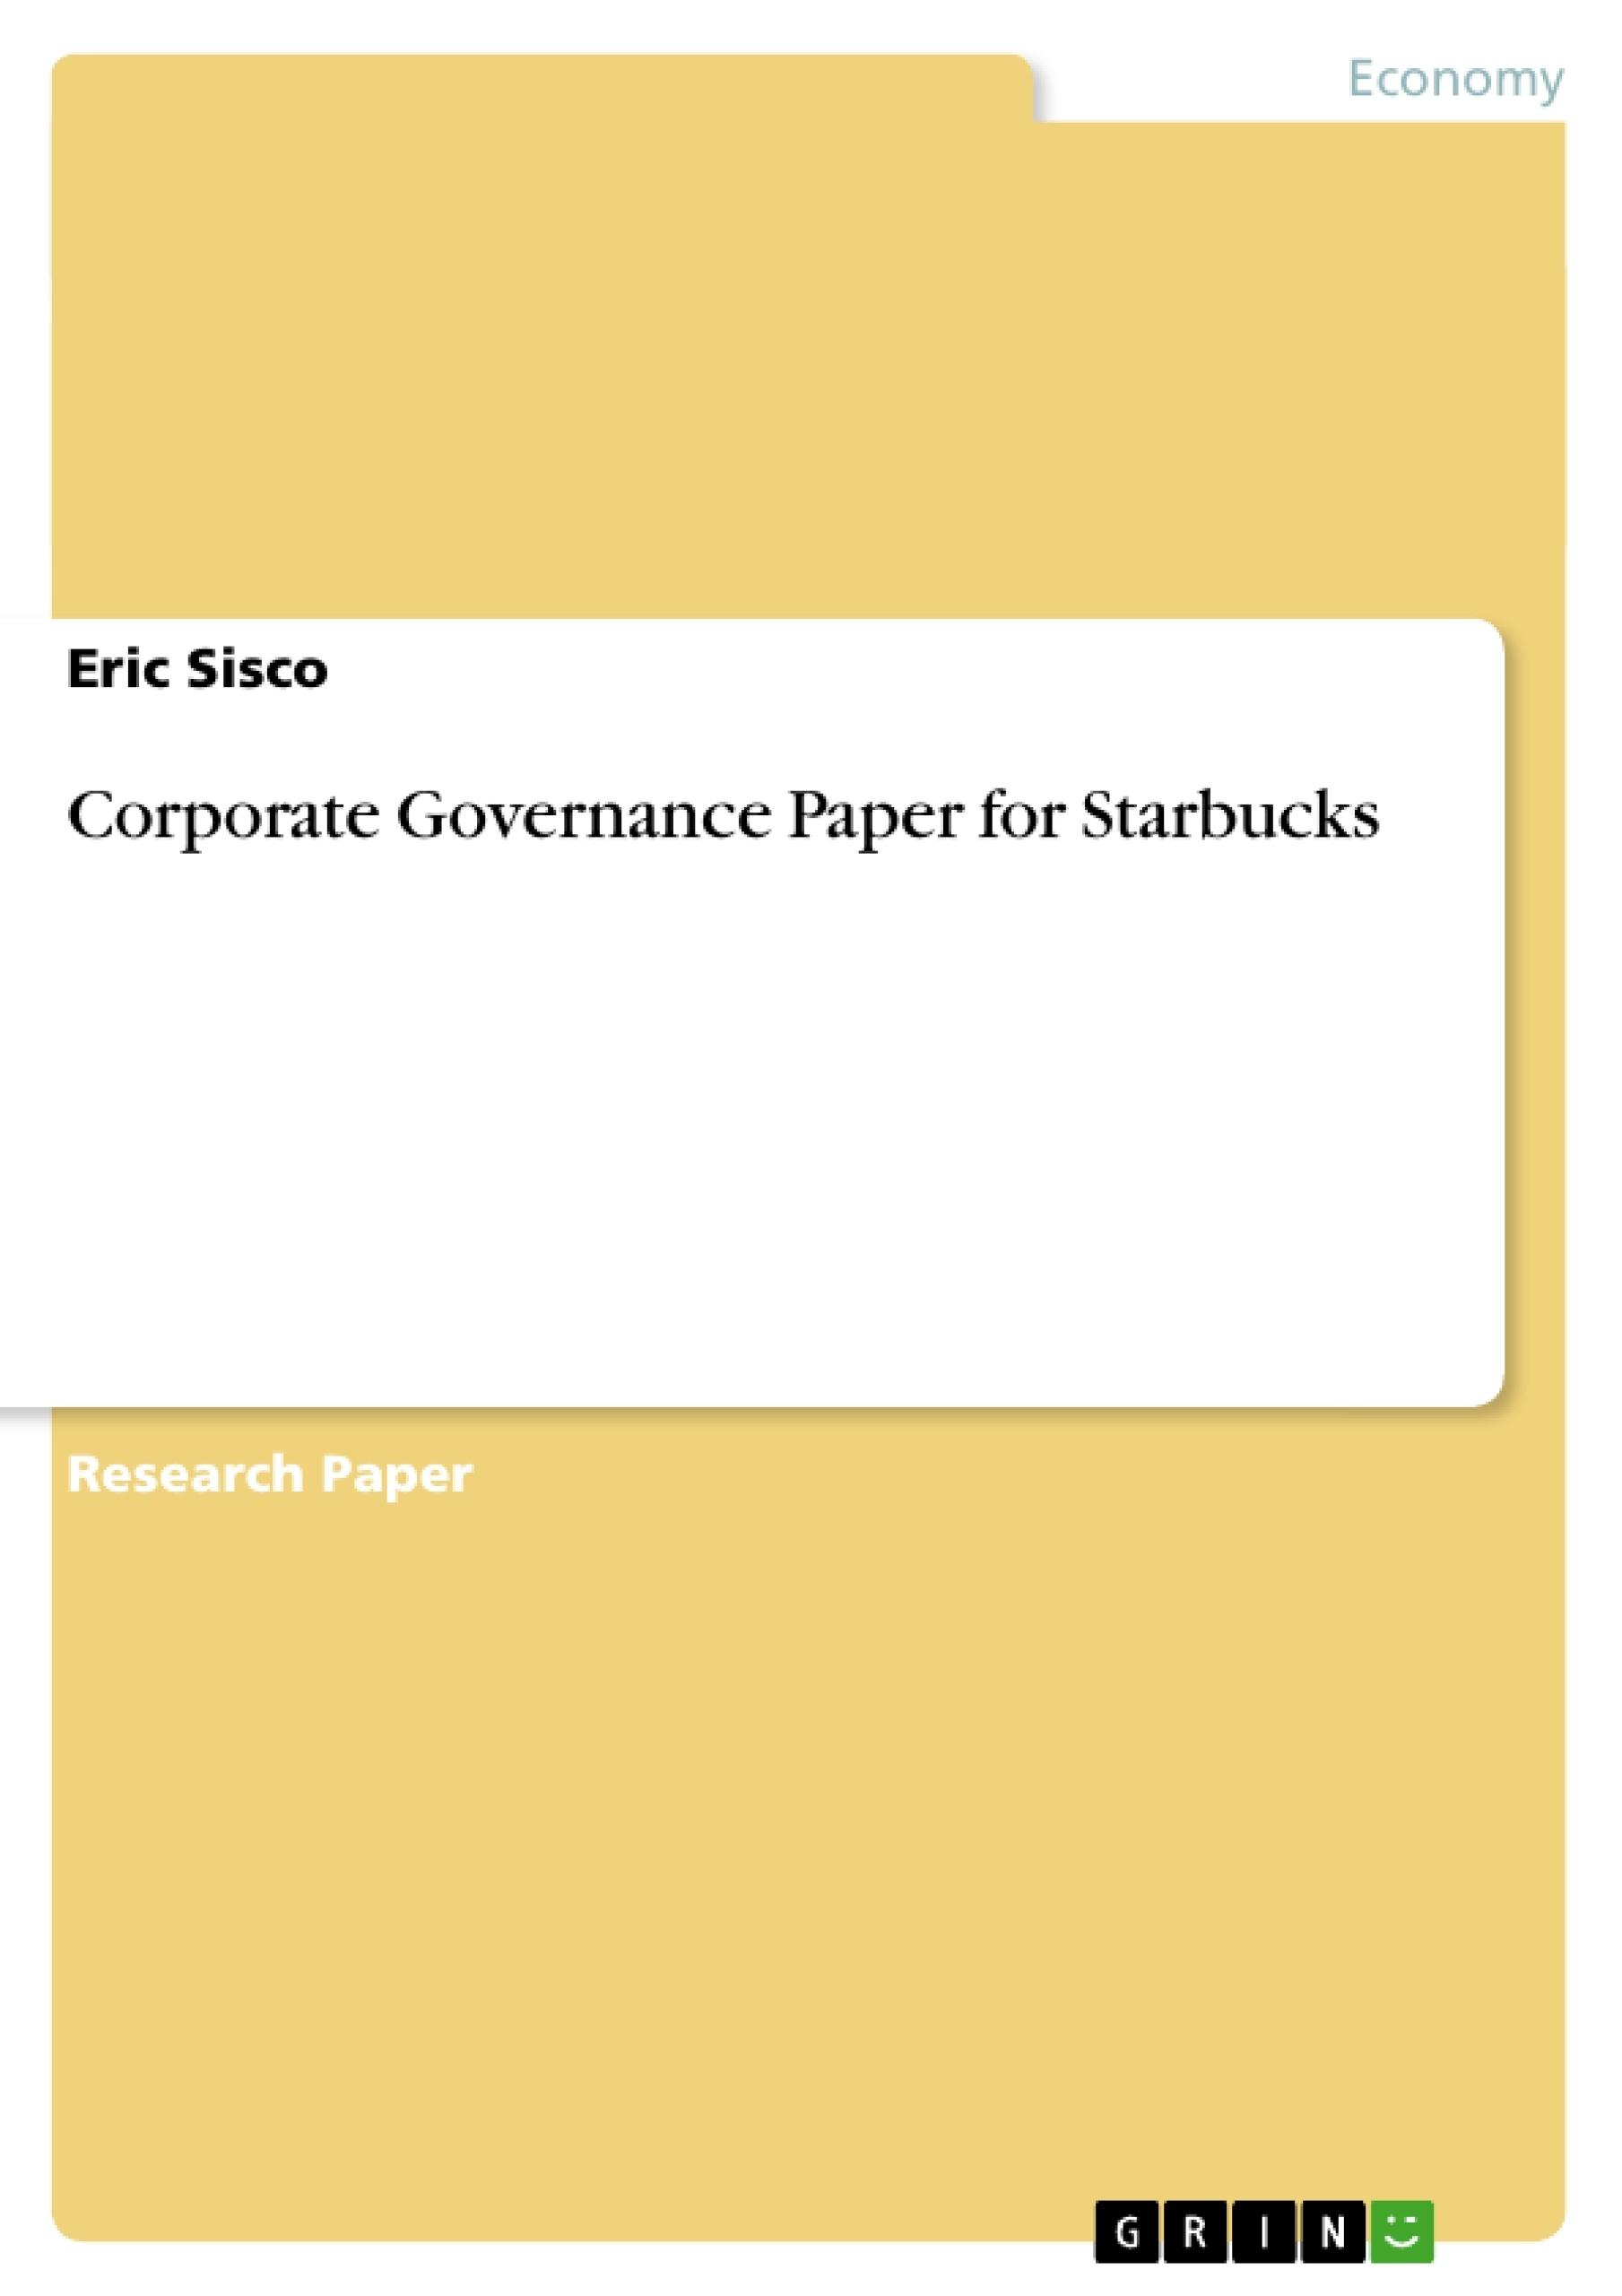 Title: Corporate Governance Paper for Starbucks